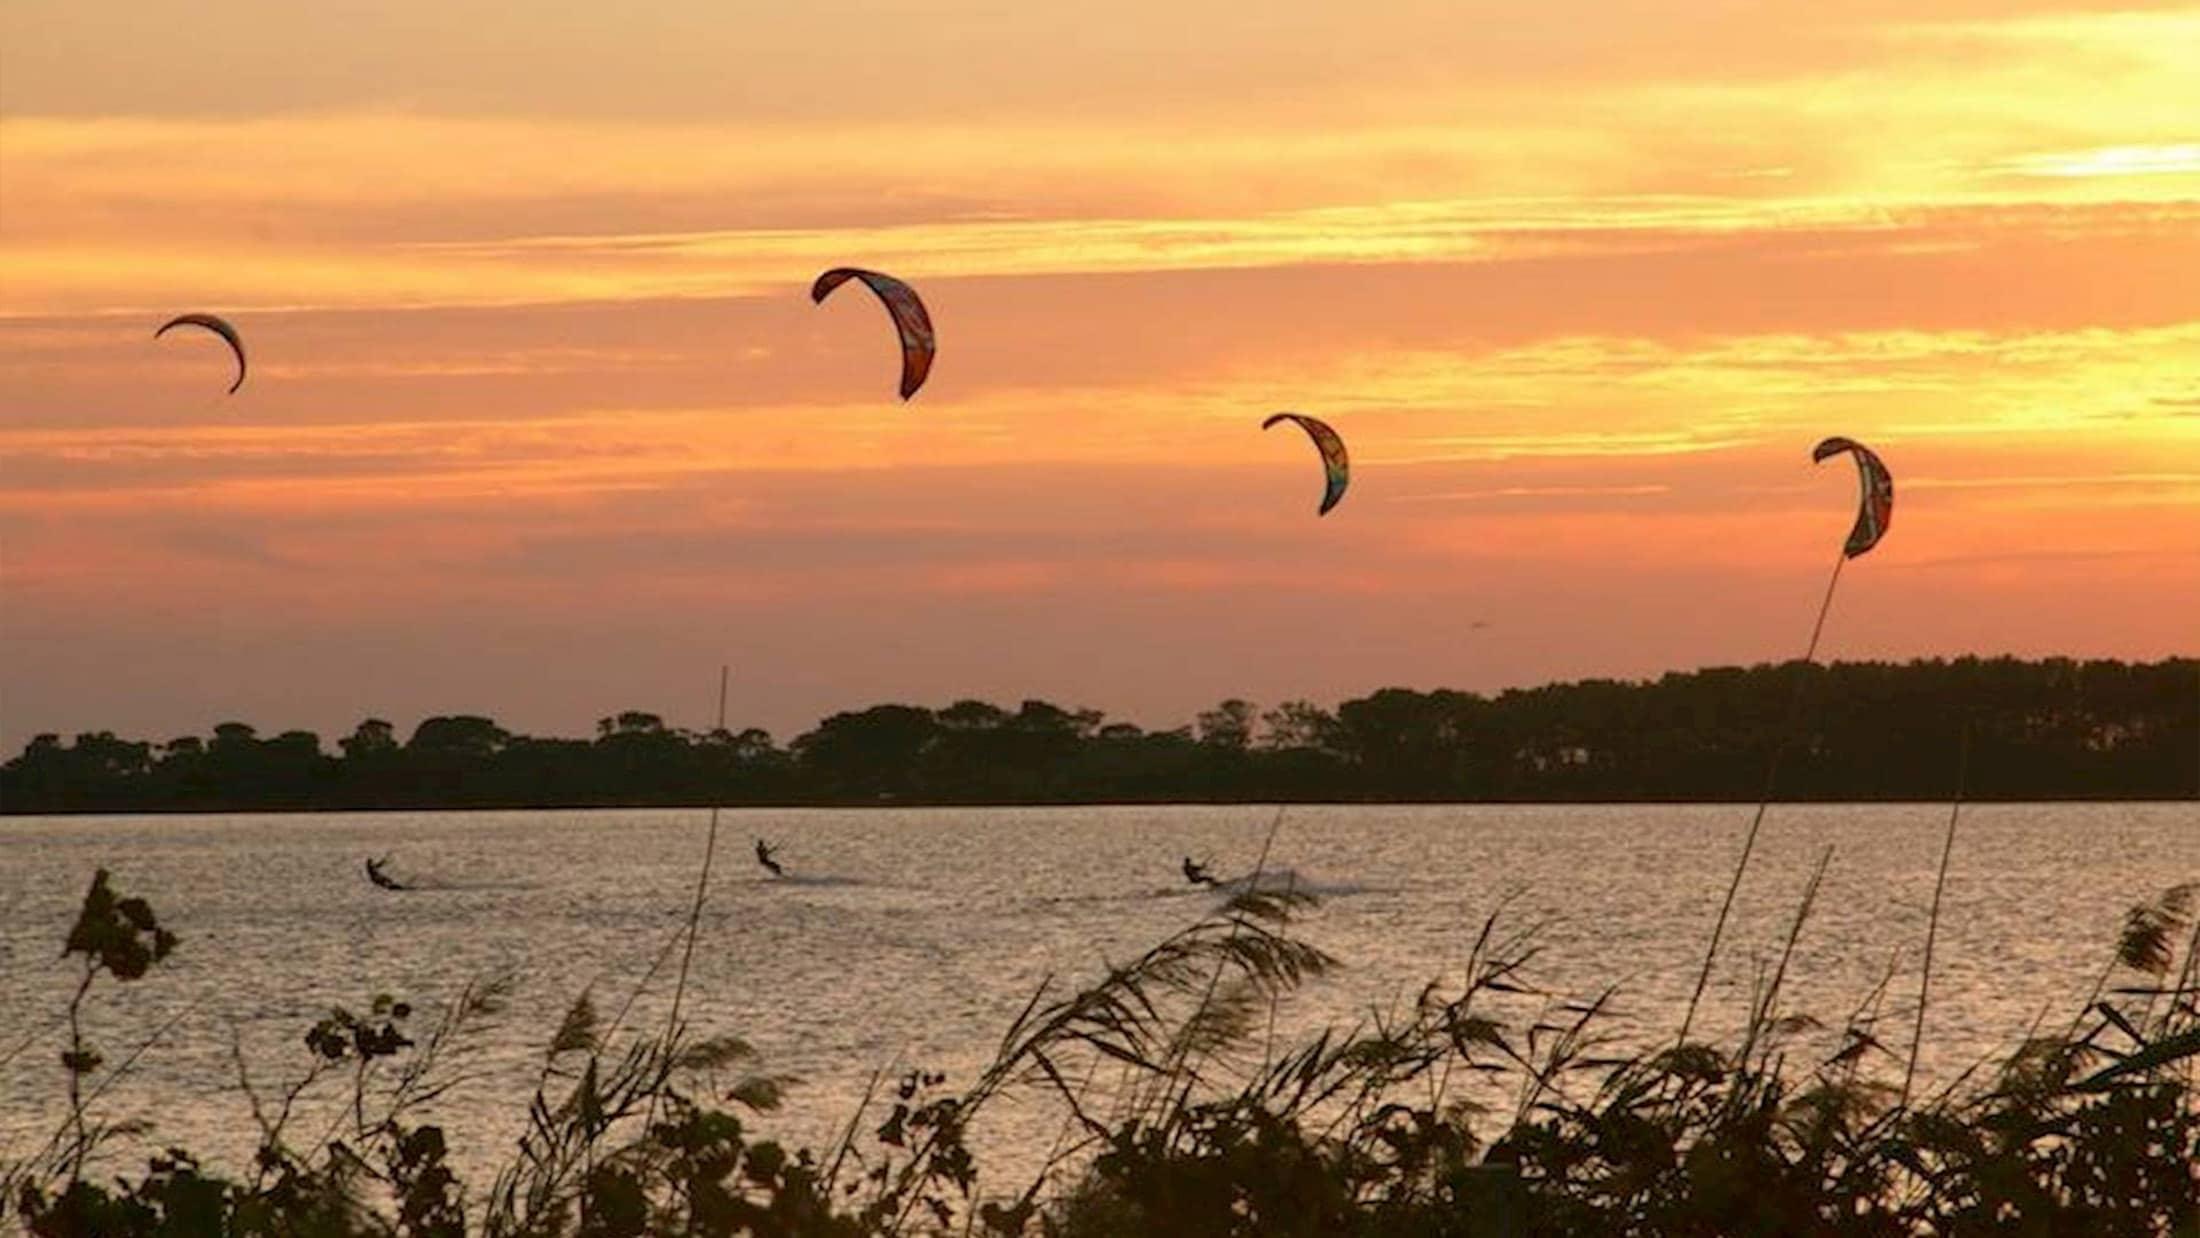 Lo-Stagnone-Lagoon-marsala-kitesurf-Sicily-Best-Spot-Kitesurfing-Sicilia-Flow-Kite-School-Cabrinha-duotone-kiteboarding-sup-stand-up-paddle-board-sea-sunset-session